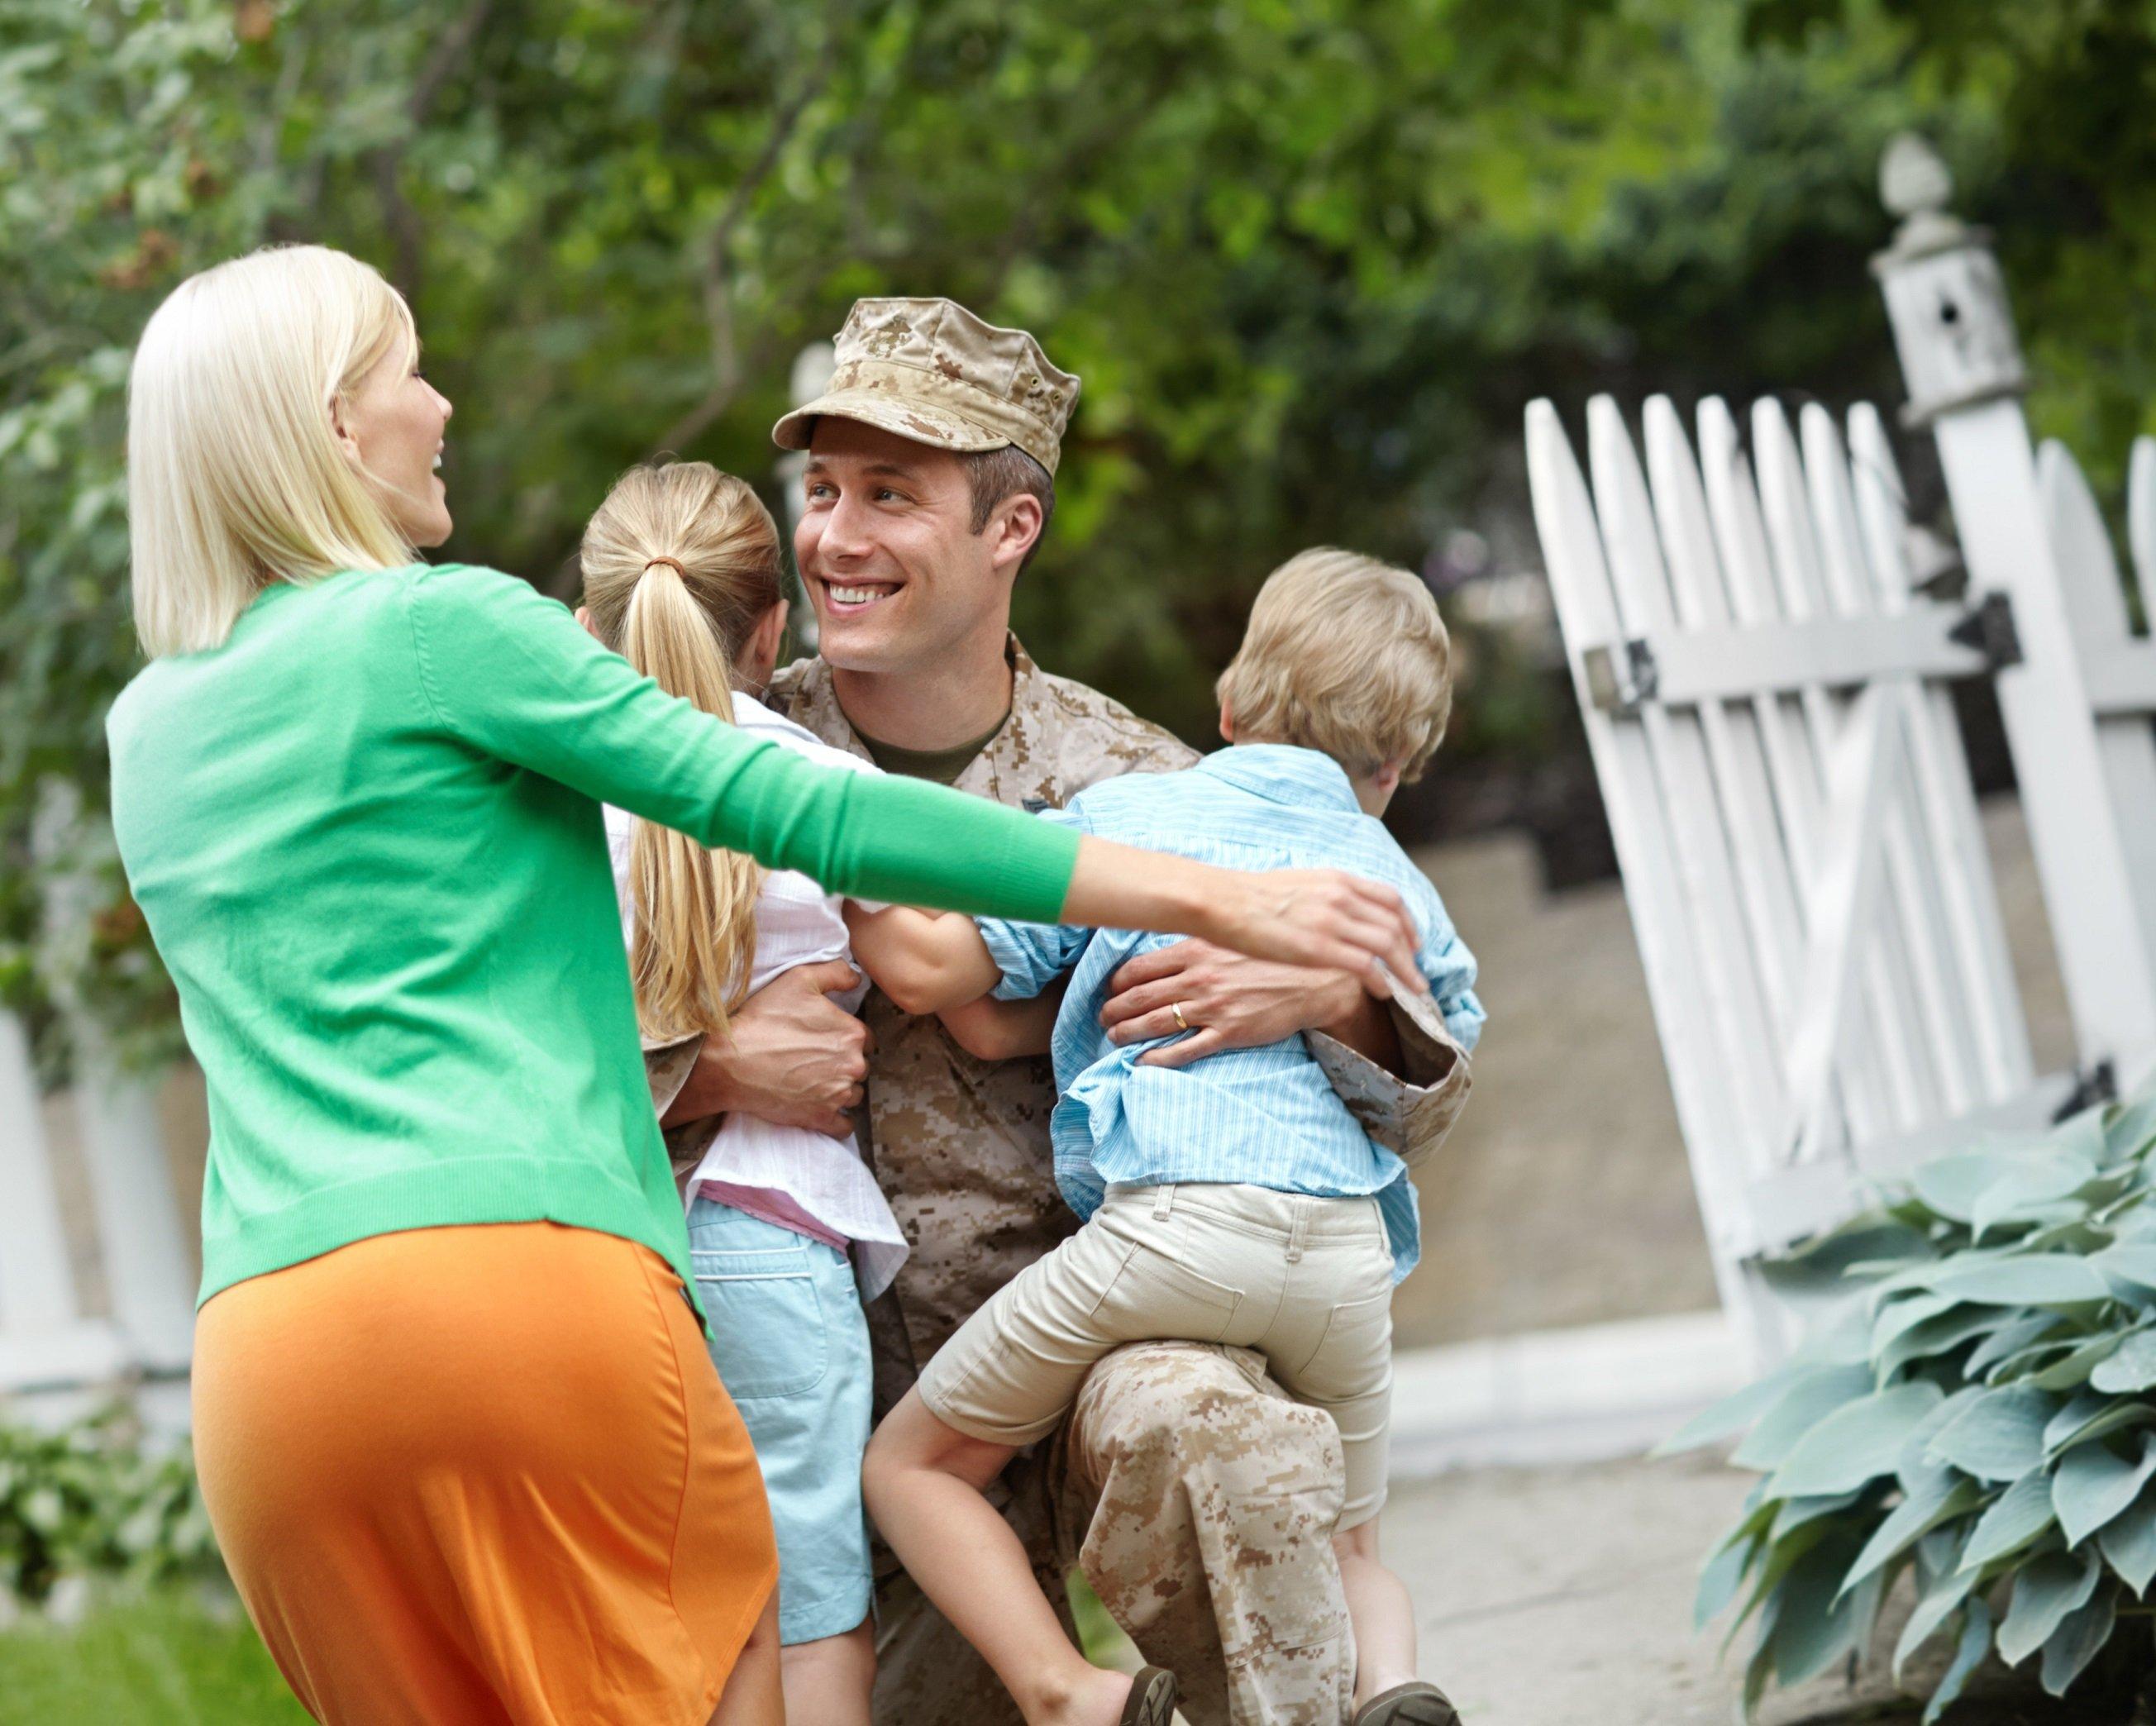 A veteran hugs his family.